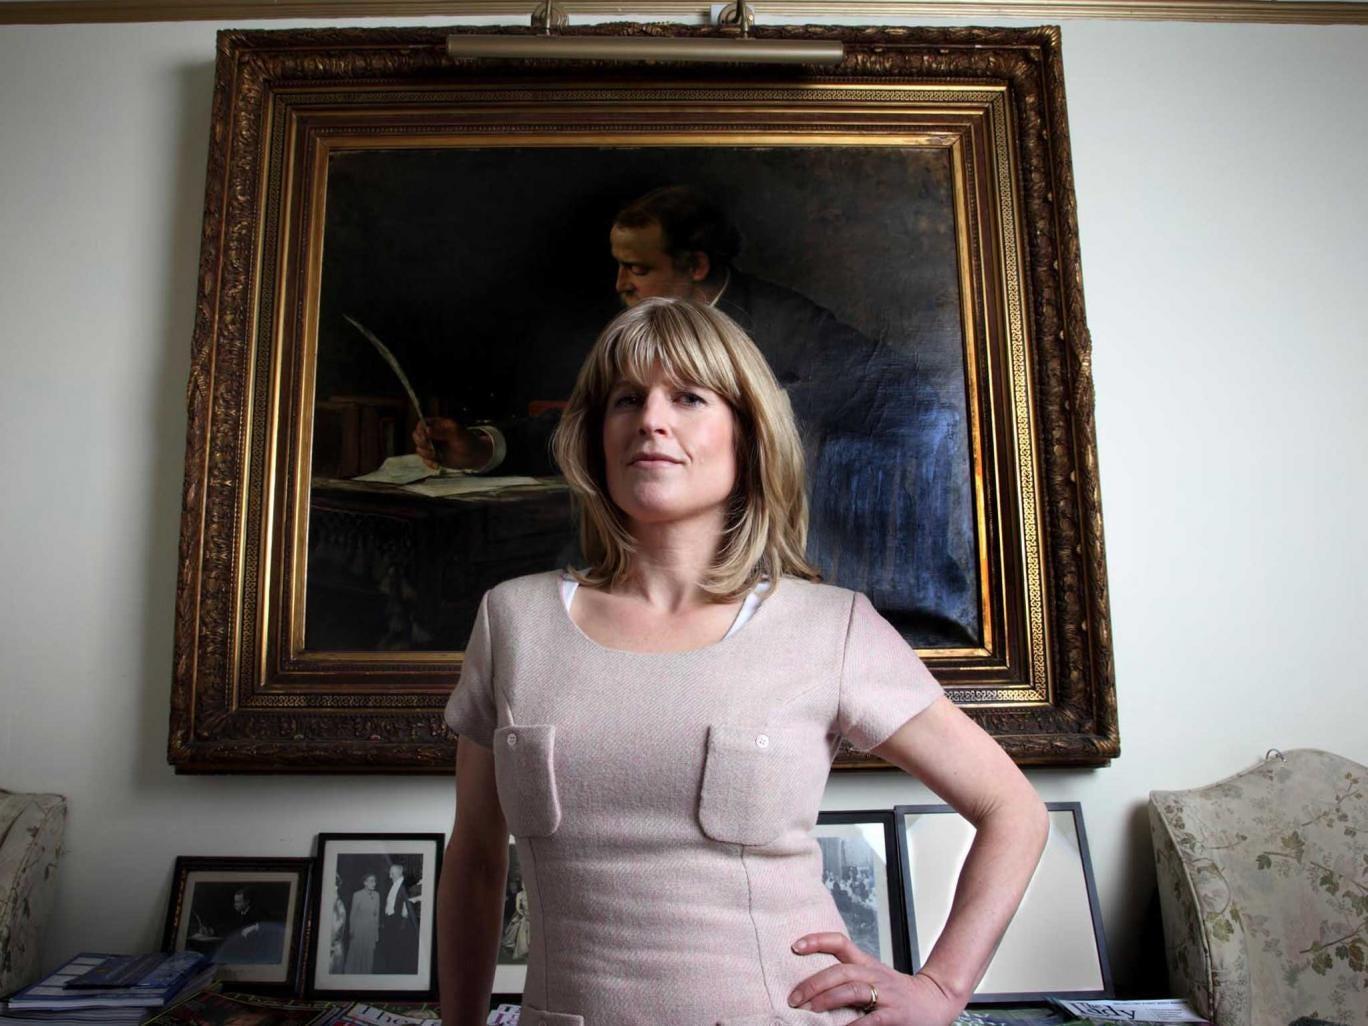 Rachel Johnson won a Bad Sex Award in 2008